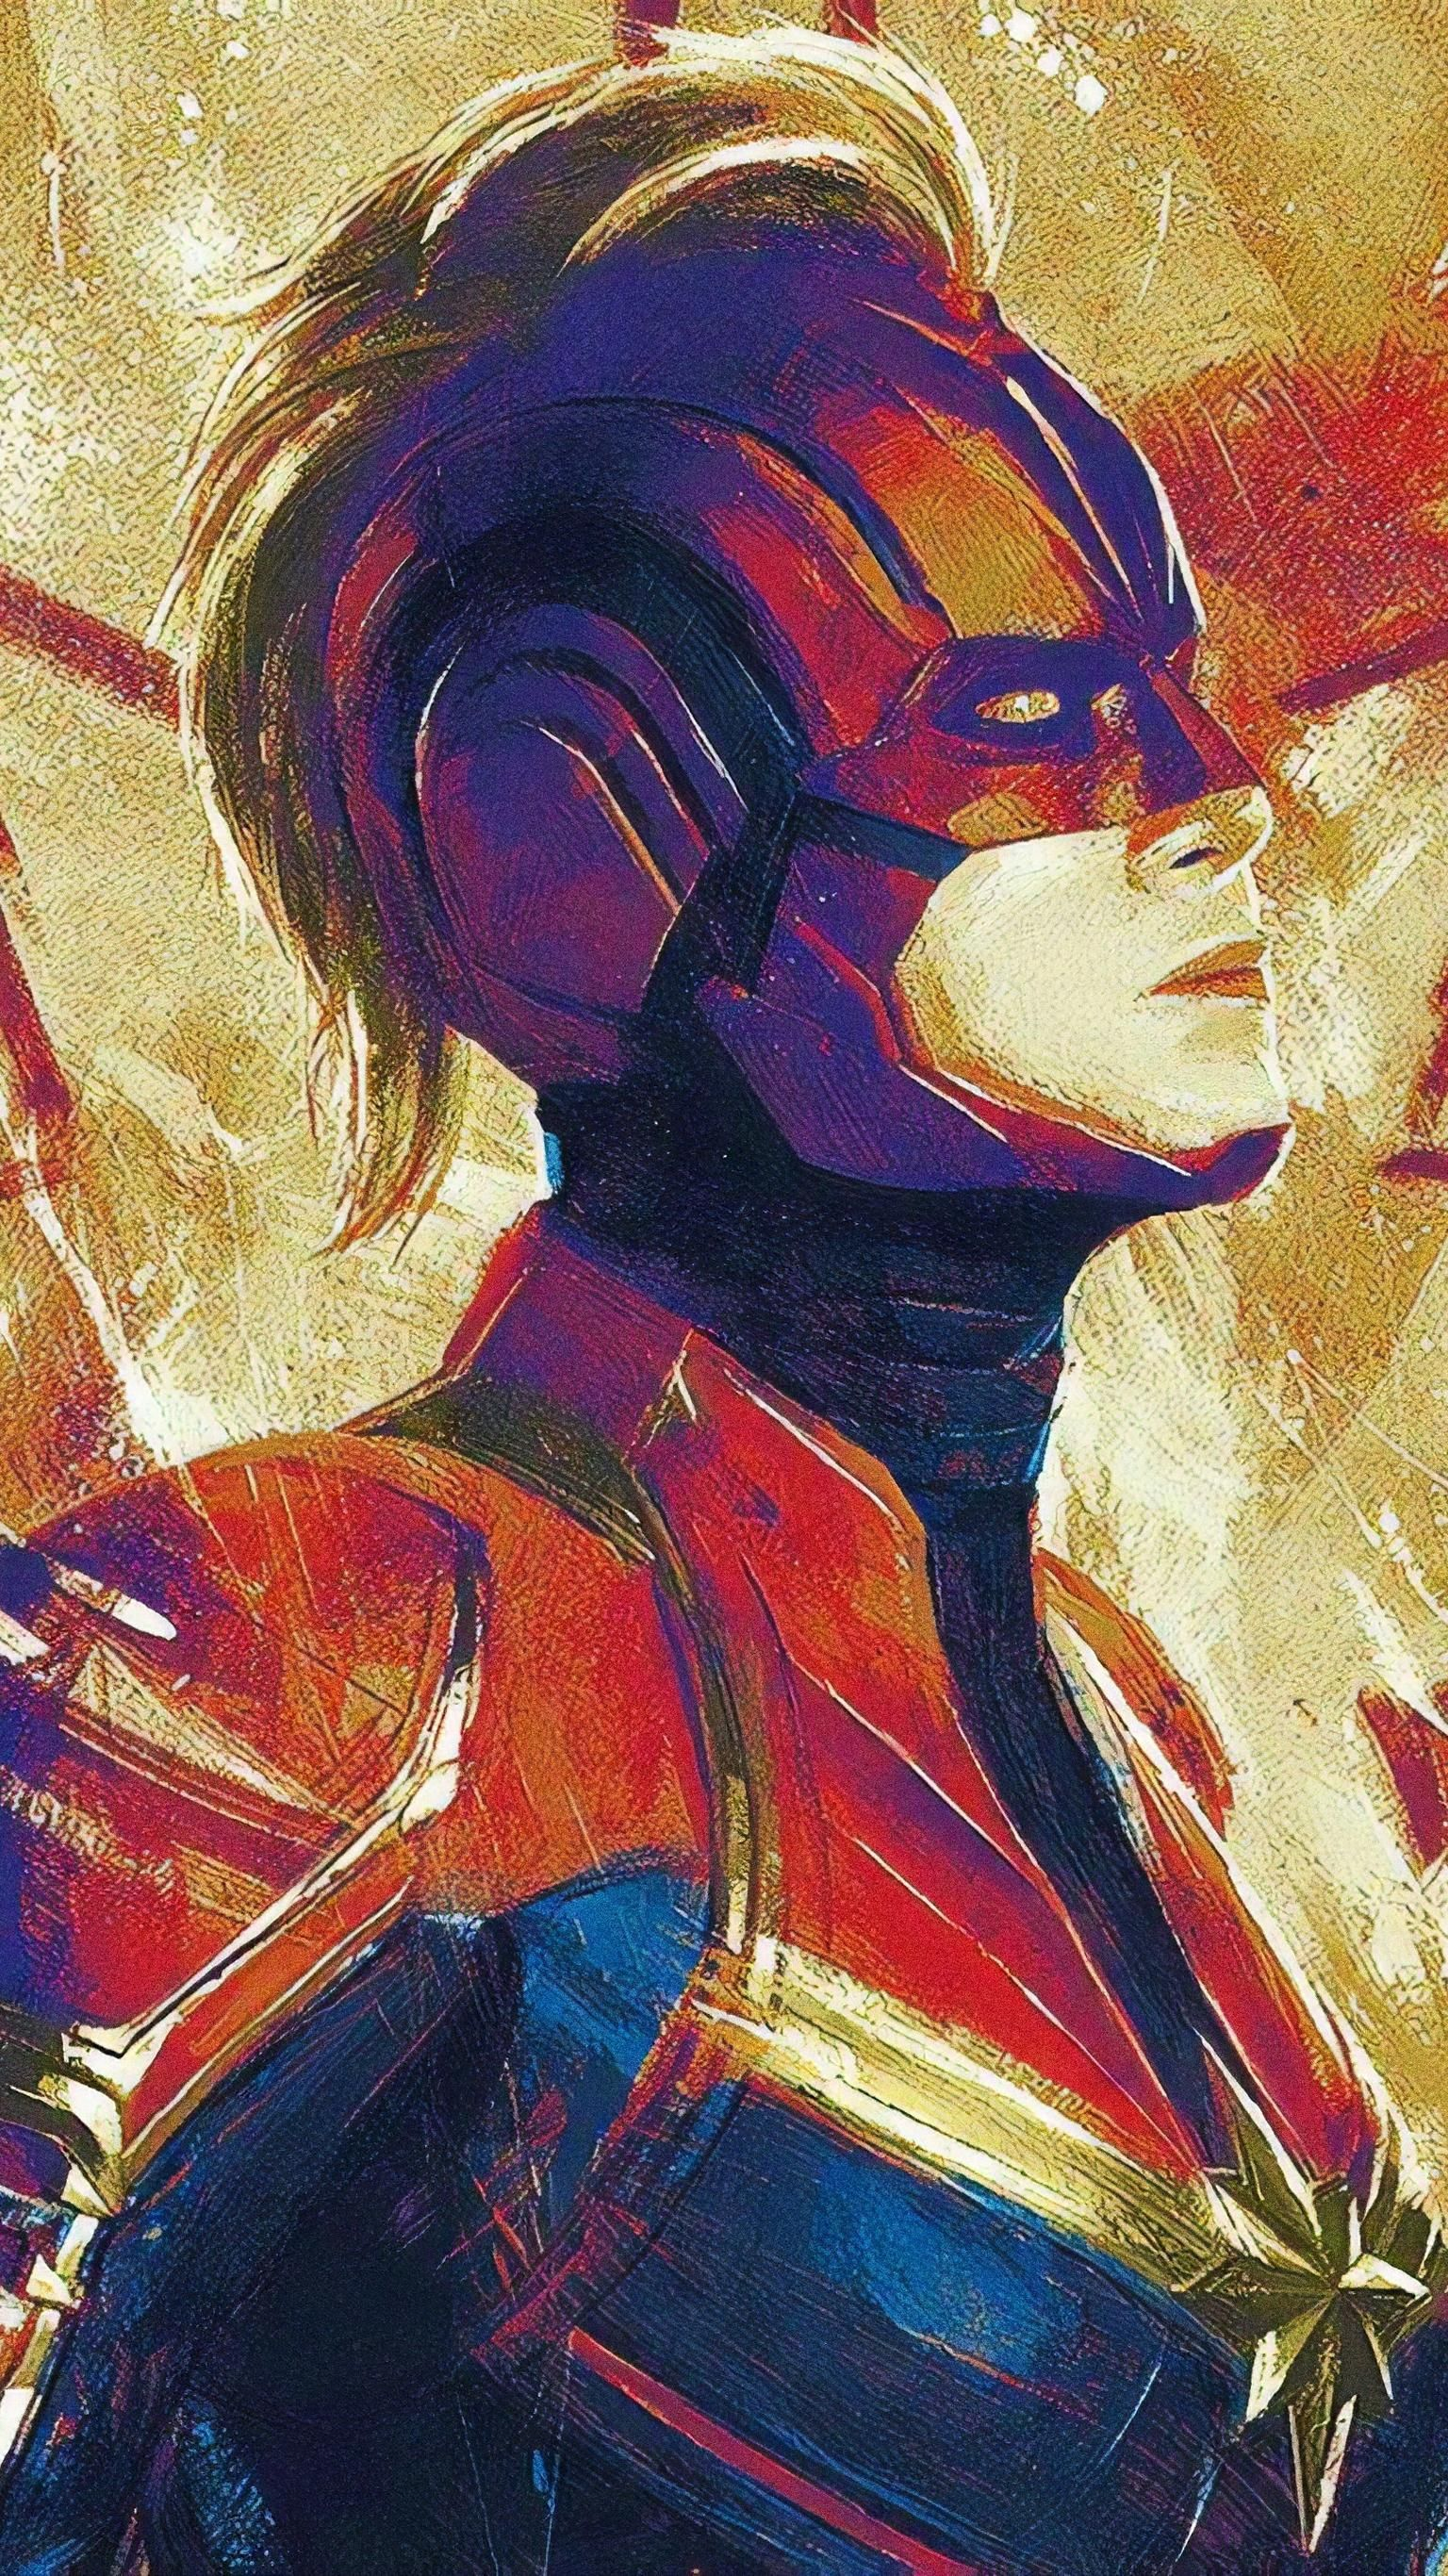 Get Good Marvel Background for Smartphones Today